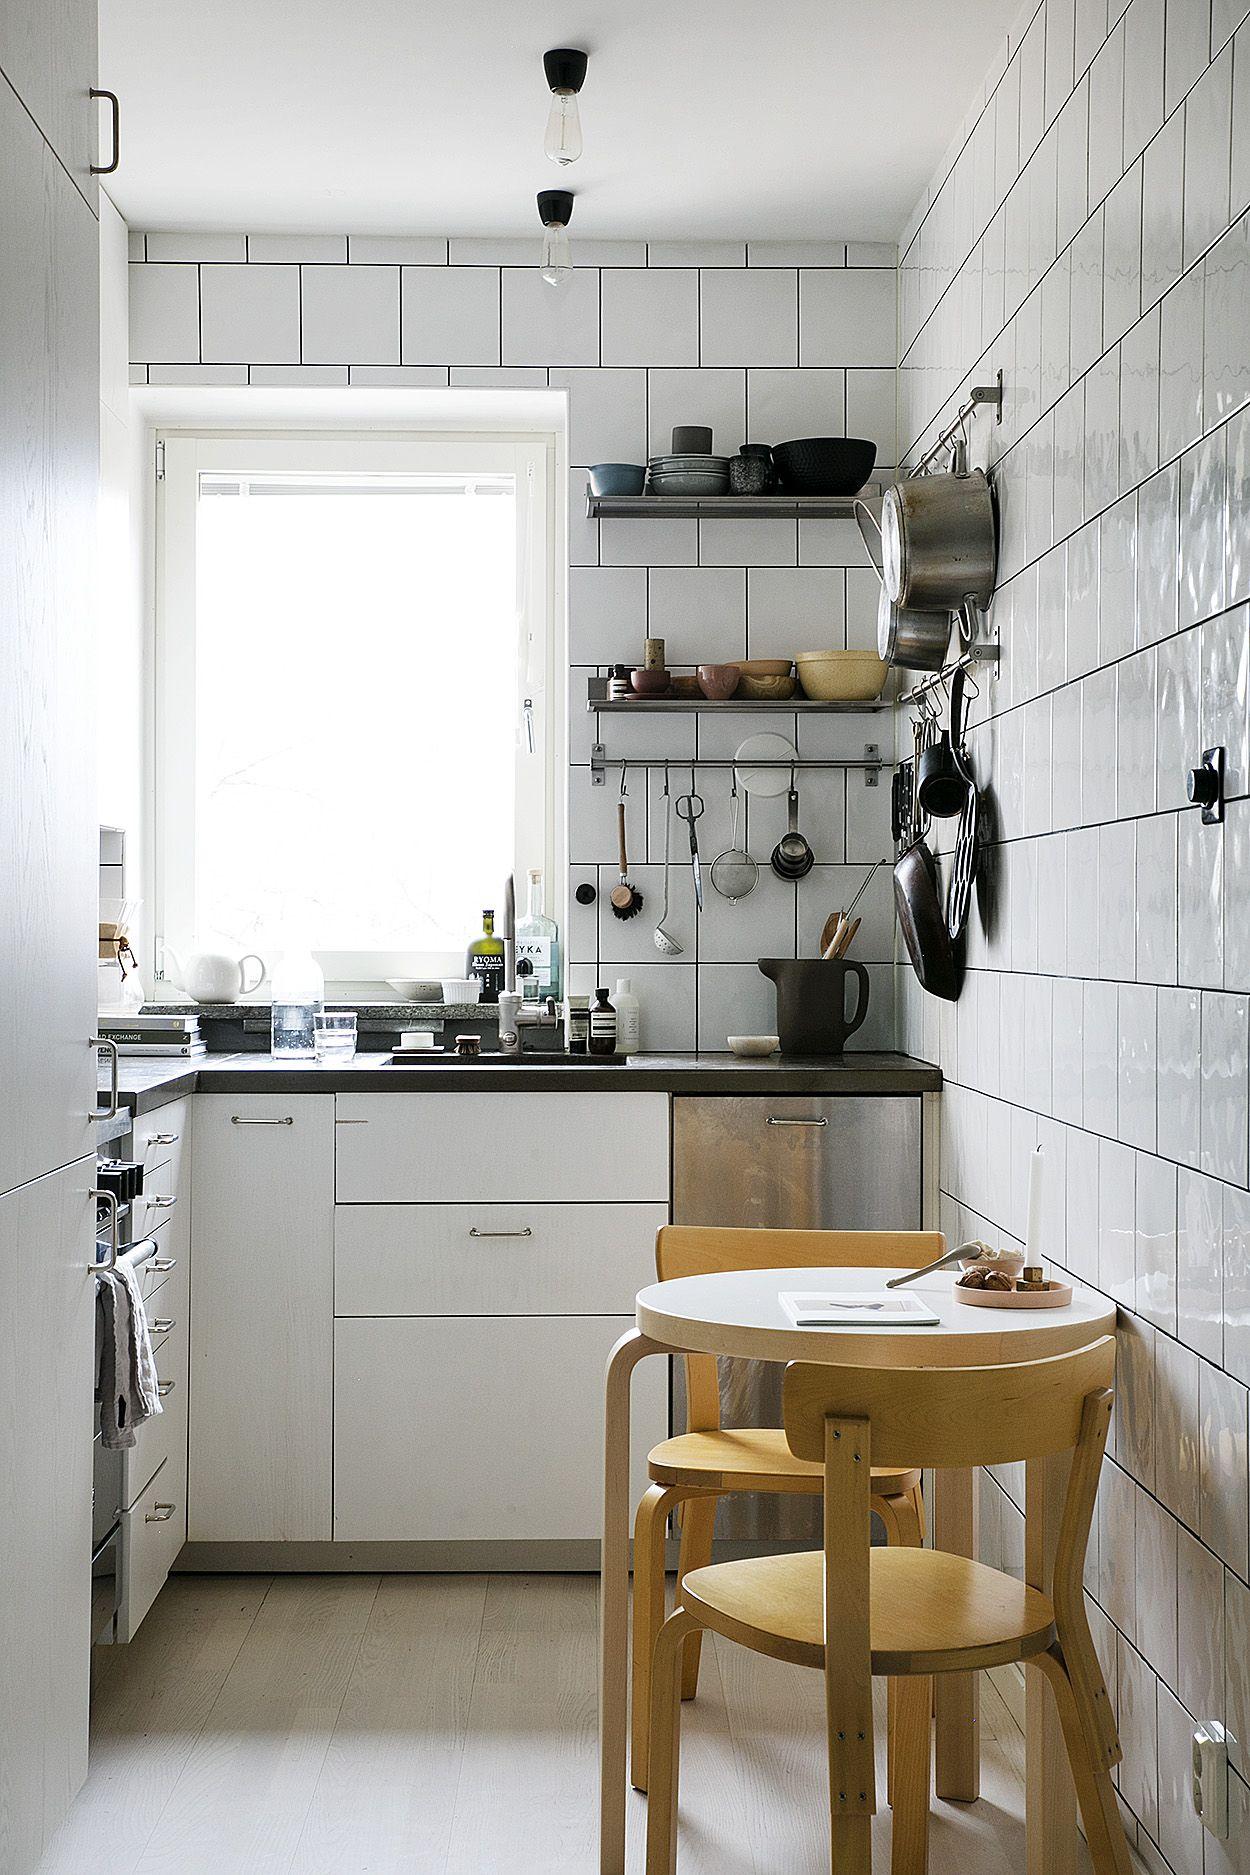 Pin by Savannah Altman on Future Home | Pinterest | Scandinavian ...